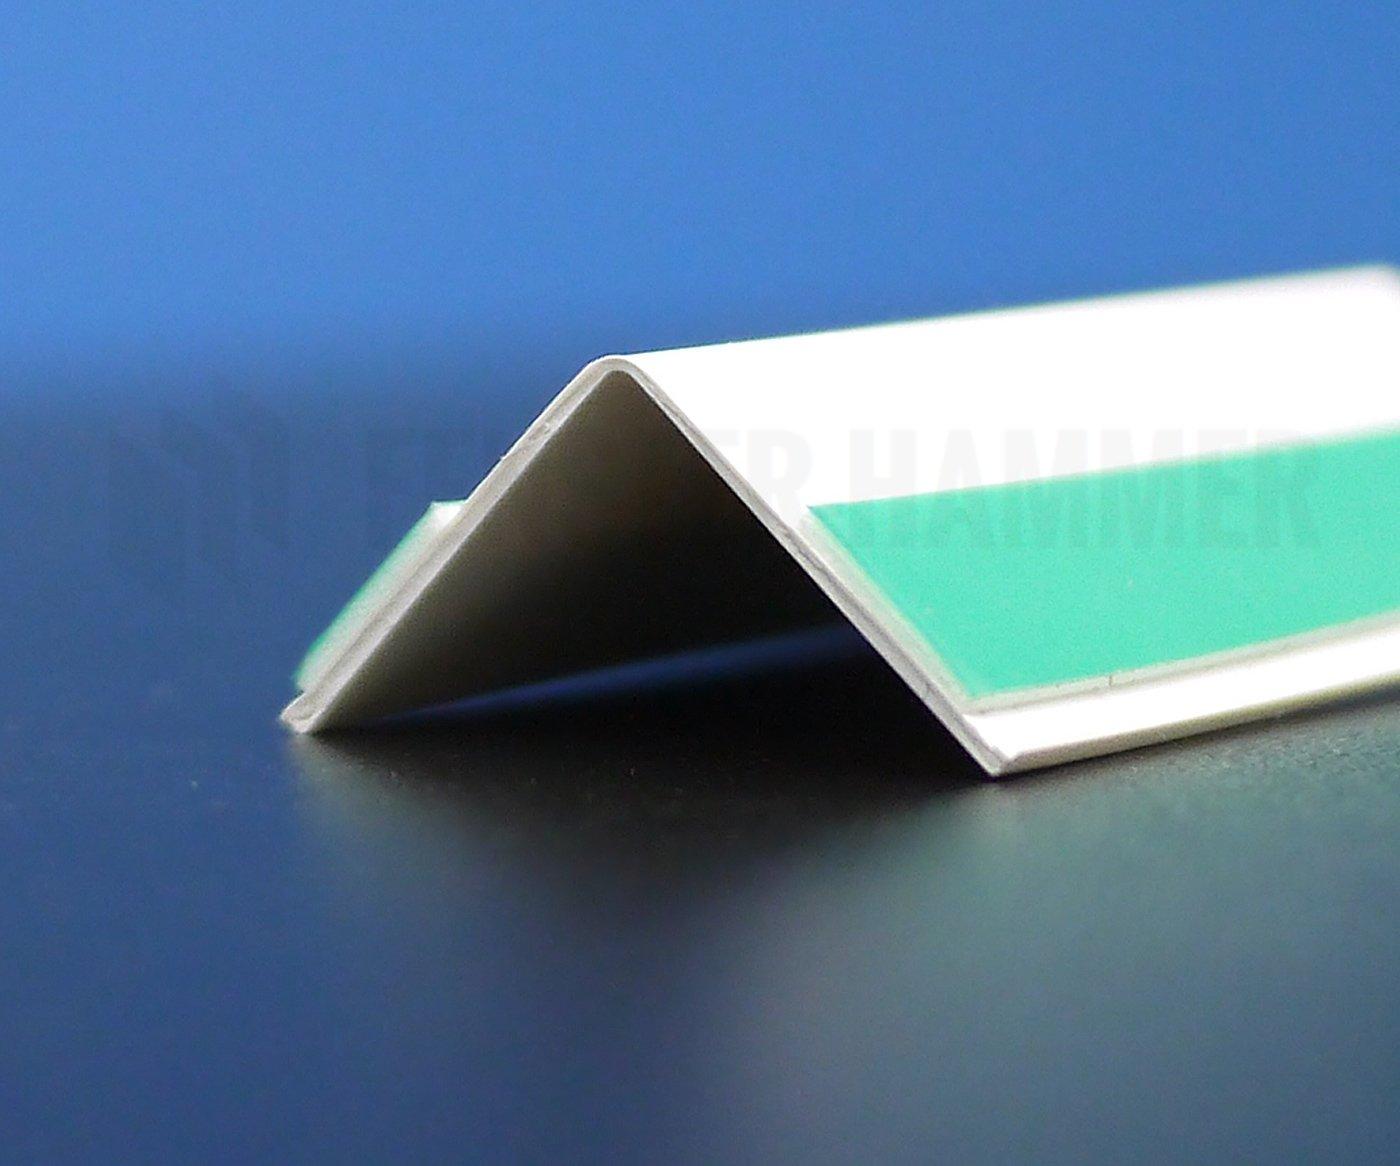 Knickwinkel selbstklebend Winkelleiste 35x35mm 10m lang Winkelprofil Fensterleiste auf Rolle